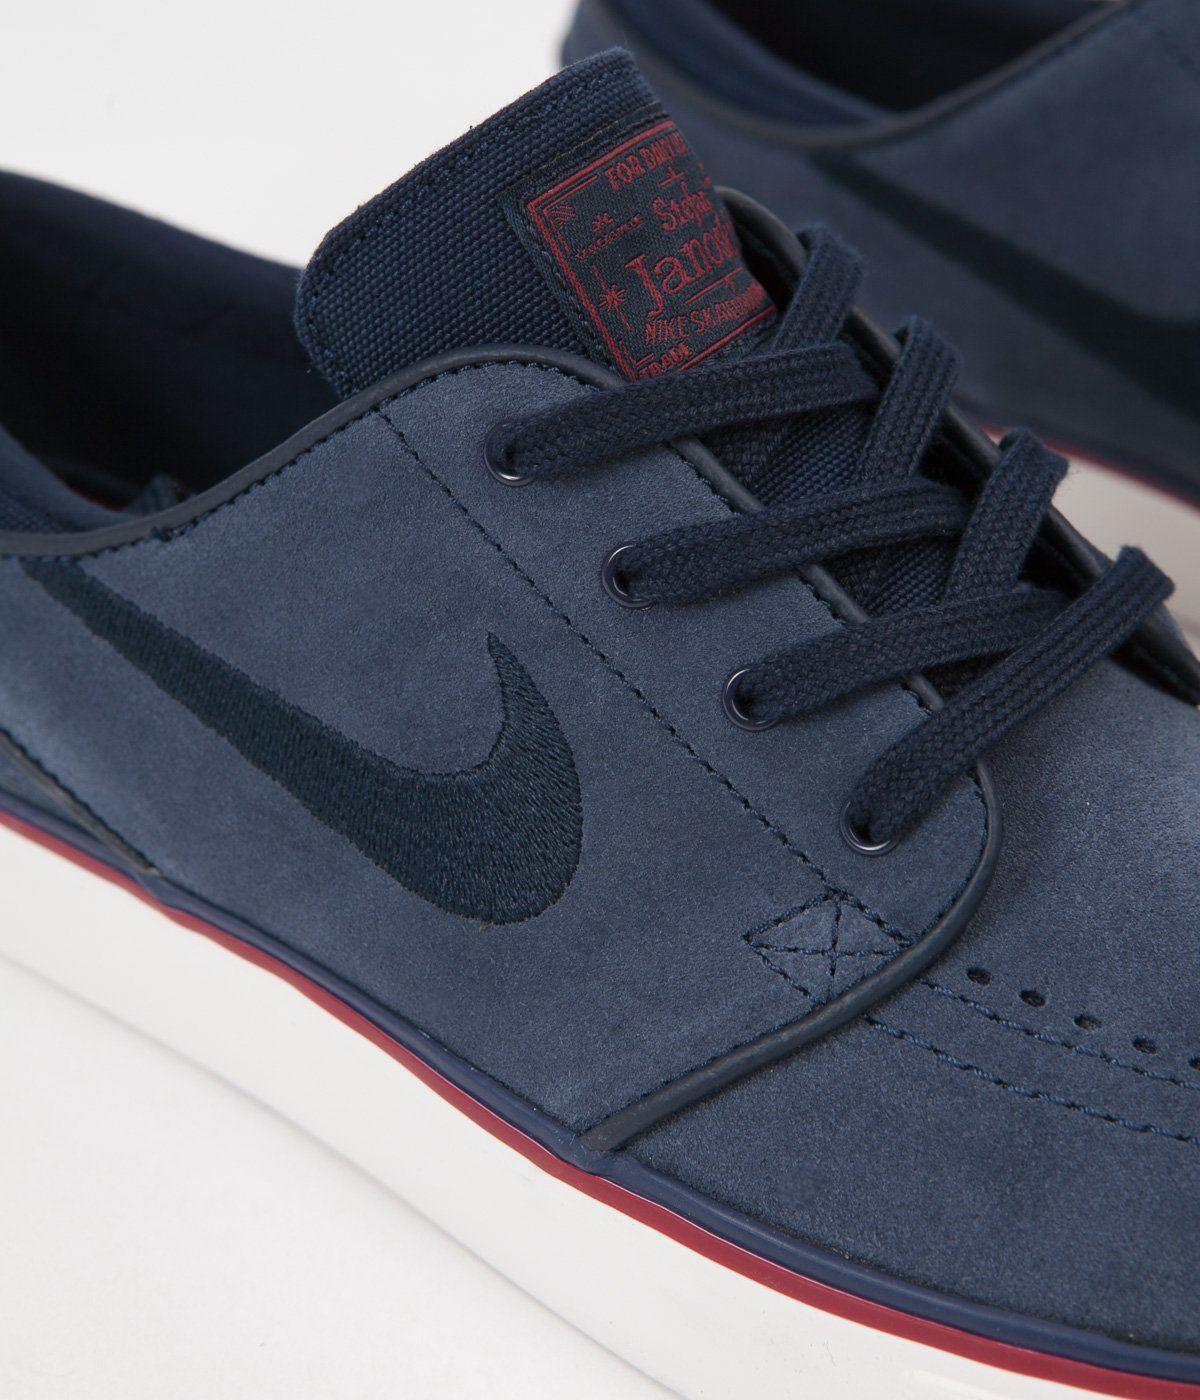 Nike SB Womens Stefan Janoski Shoes - Obsidian   Dark Obsidian - Team Red 98603074c